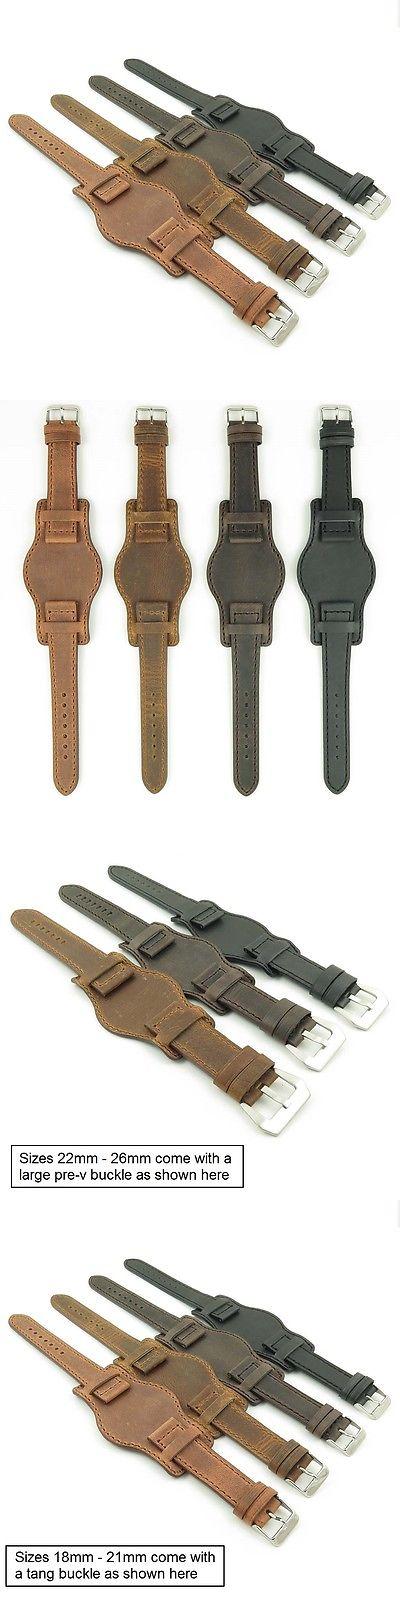 048c9b8b1 Wristwatch Bands 98624: Dassari Legend Distressed Vintage Style Bund Leather  Mens Cuff Watch Band Strap BUY IT NOW ONLY: $39.99